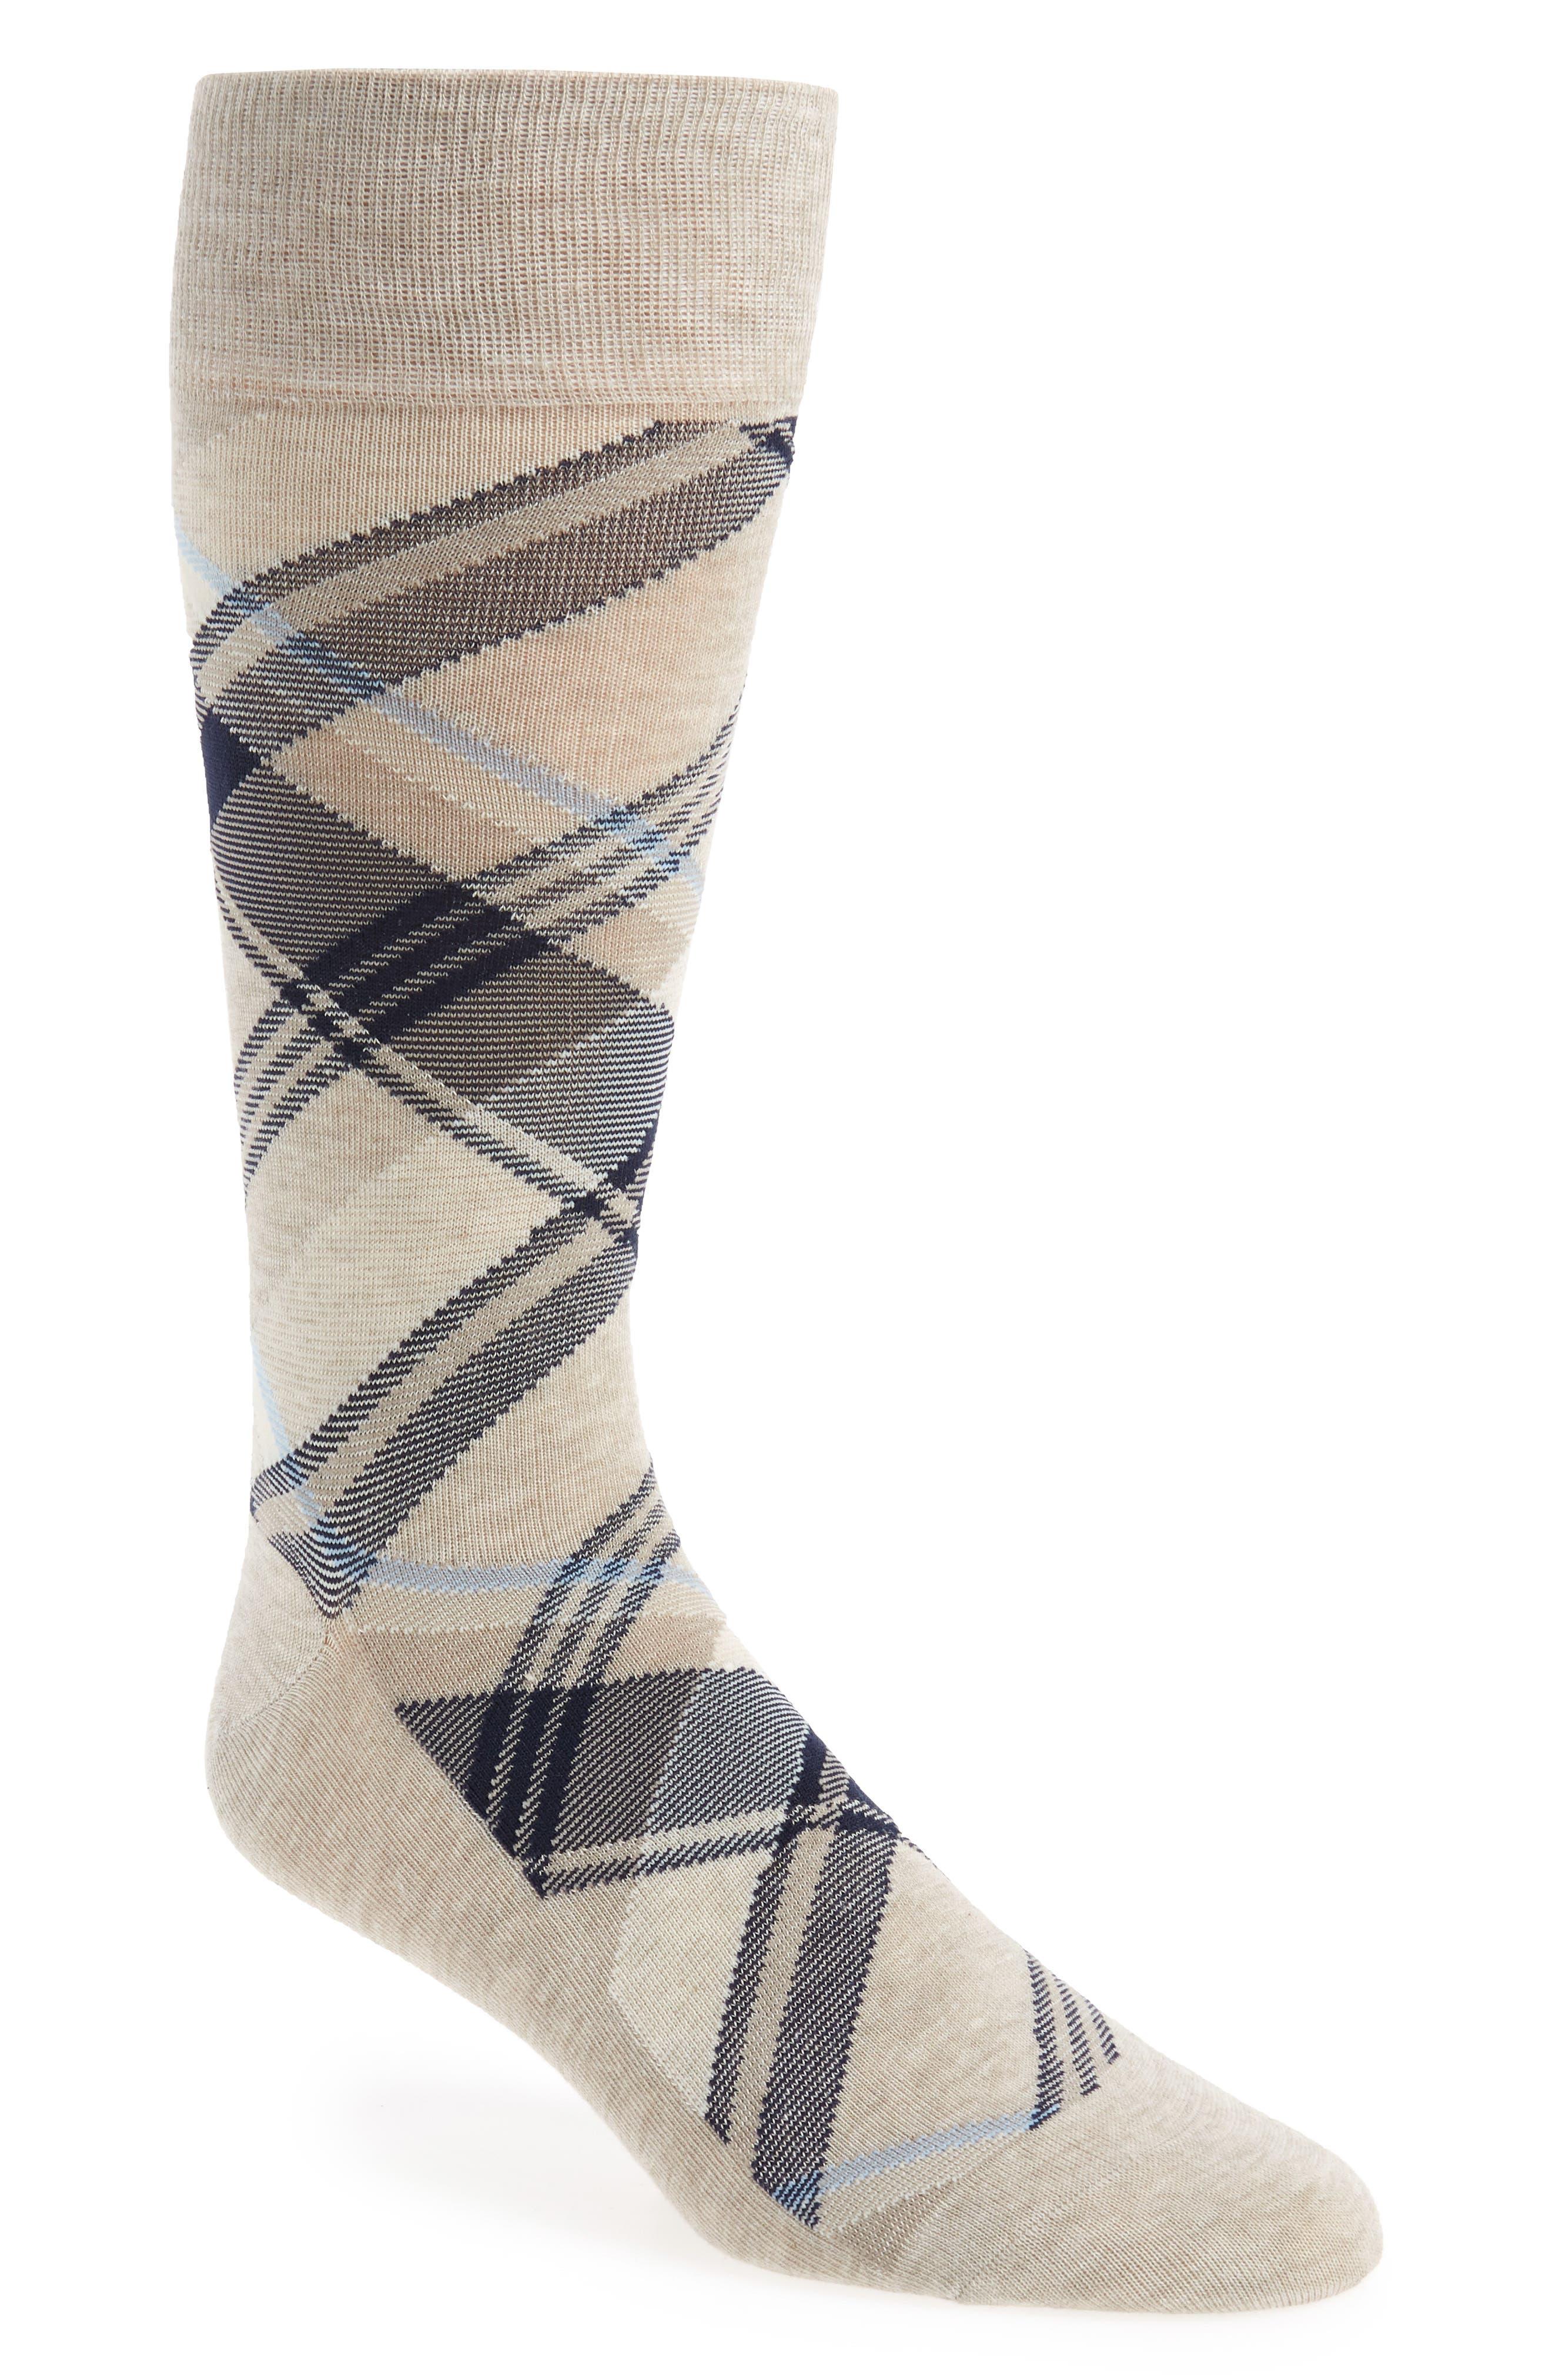 Plaid Socks,                             Main thumbnail 1, color,                             OATMEAL HEATHER